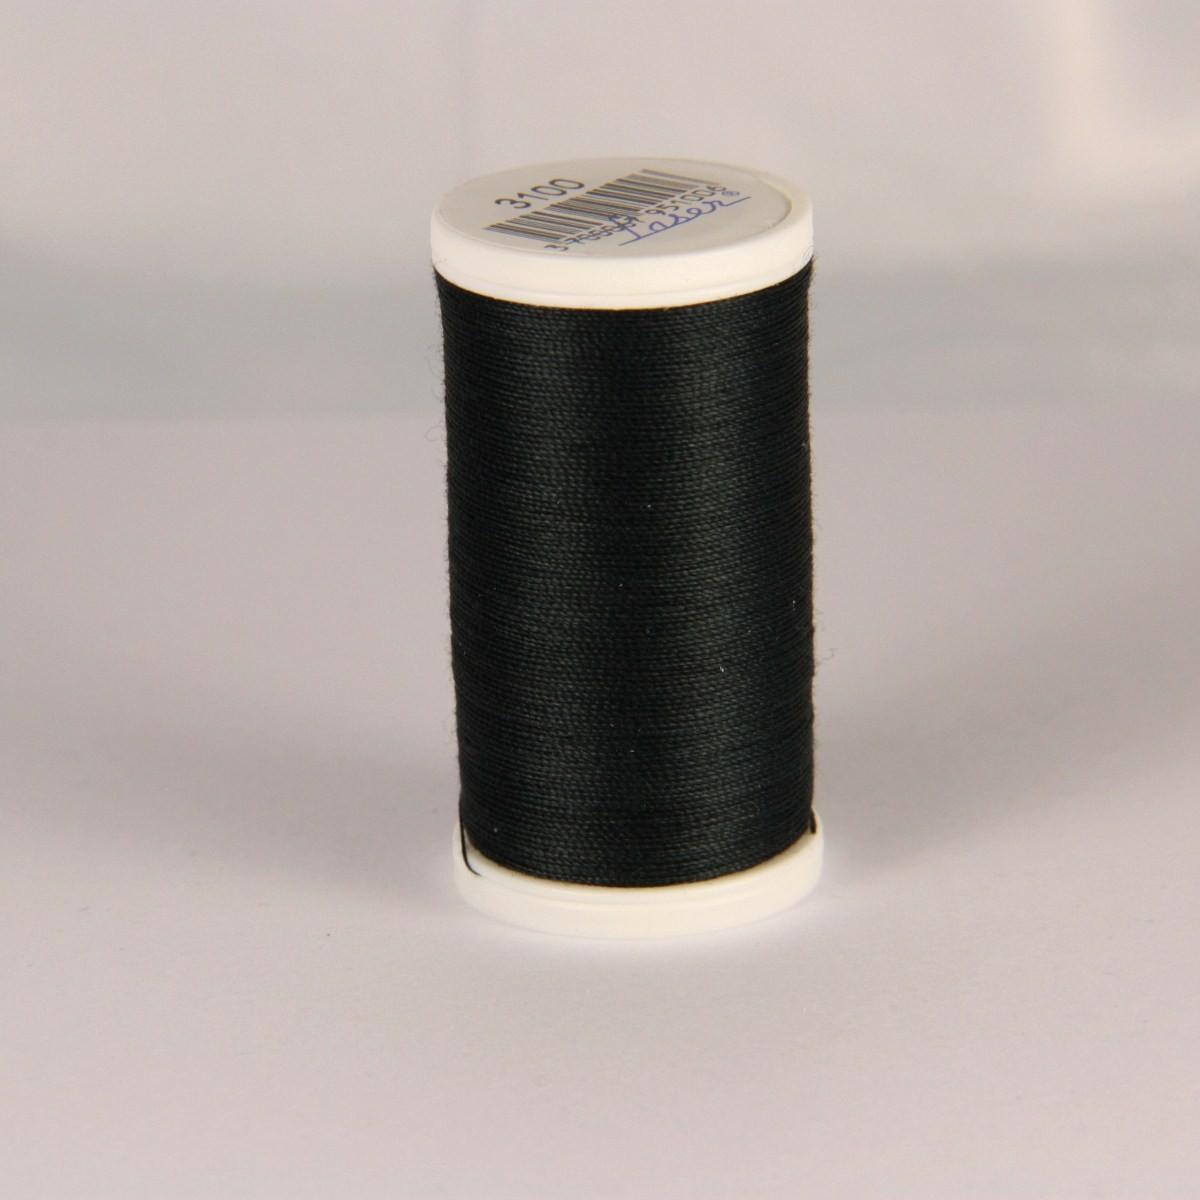 Laser 3100 Anthracite - 1.1